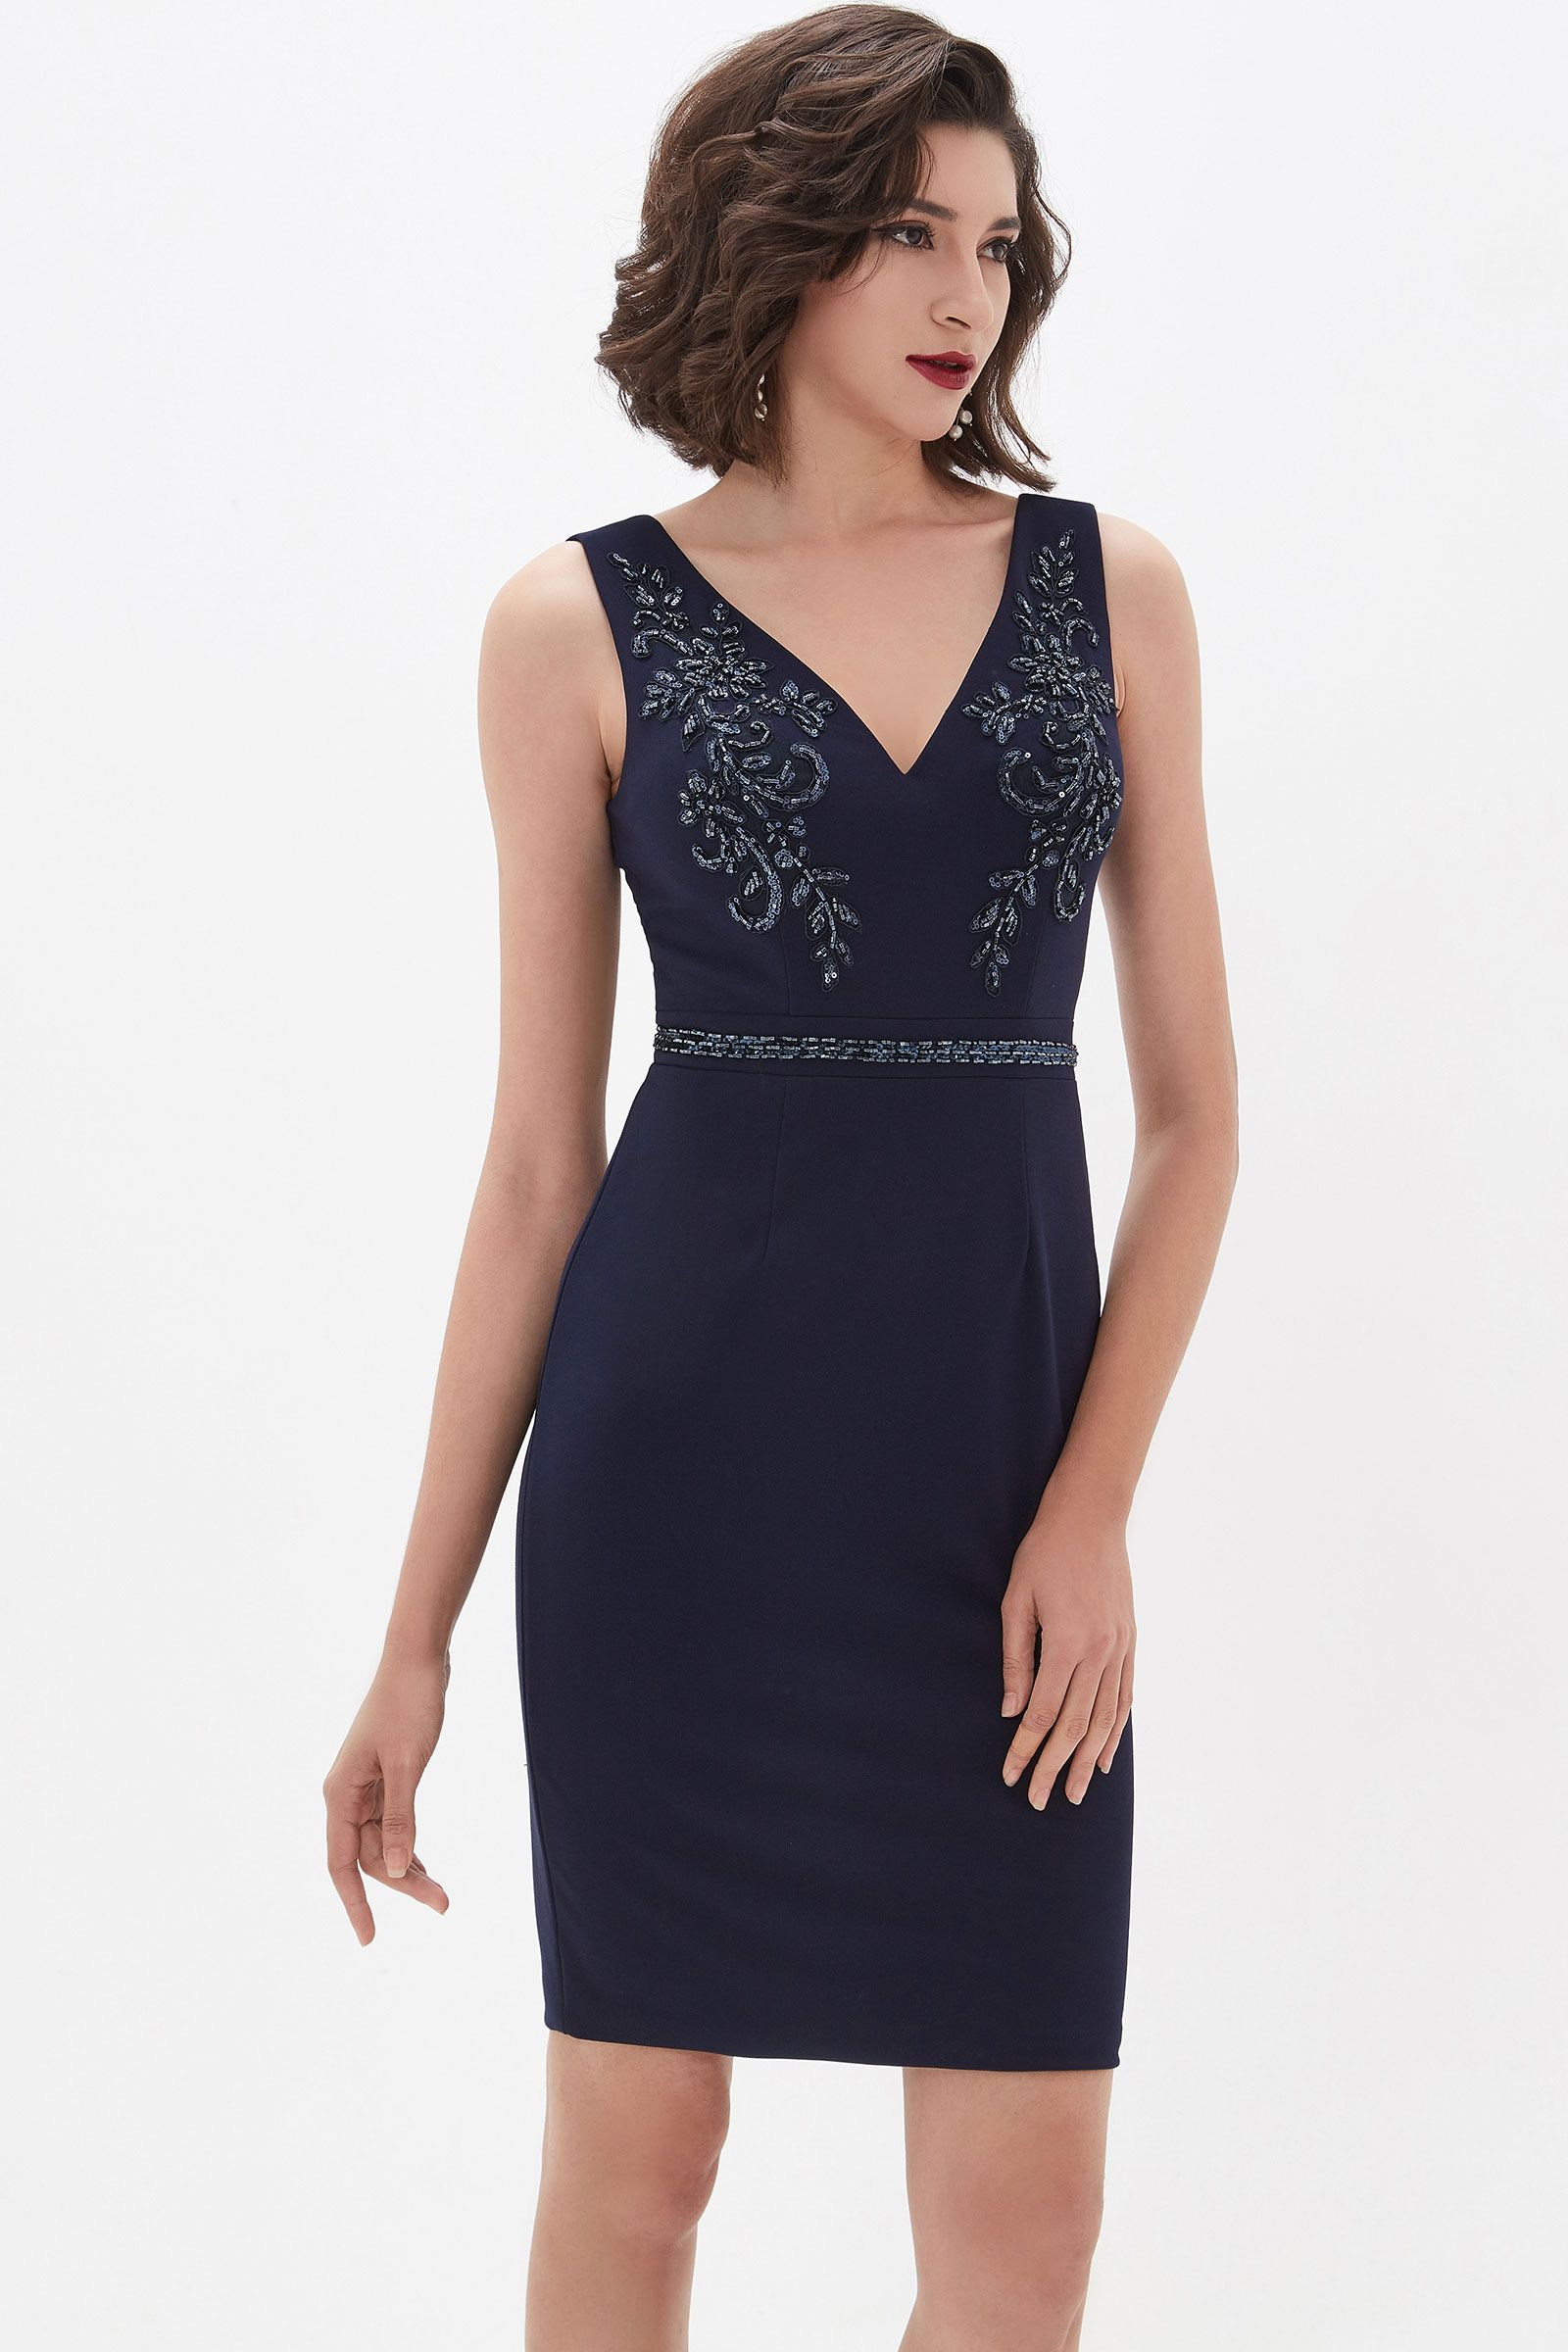 Edressit V Schnit Spitze Stretchy Stoff Kurzes Cocktailkleid 03210305 Short Cocktail Dress Dresses Blue Lace Prom Dress [ 2400 x 1600 Pixel ]